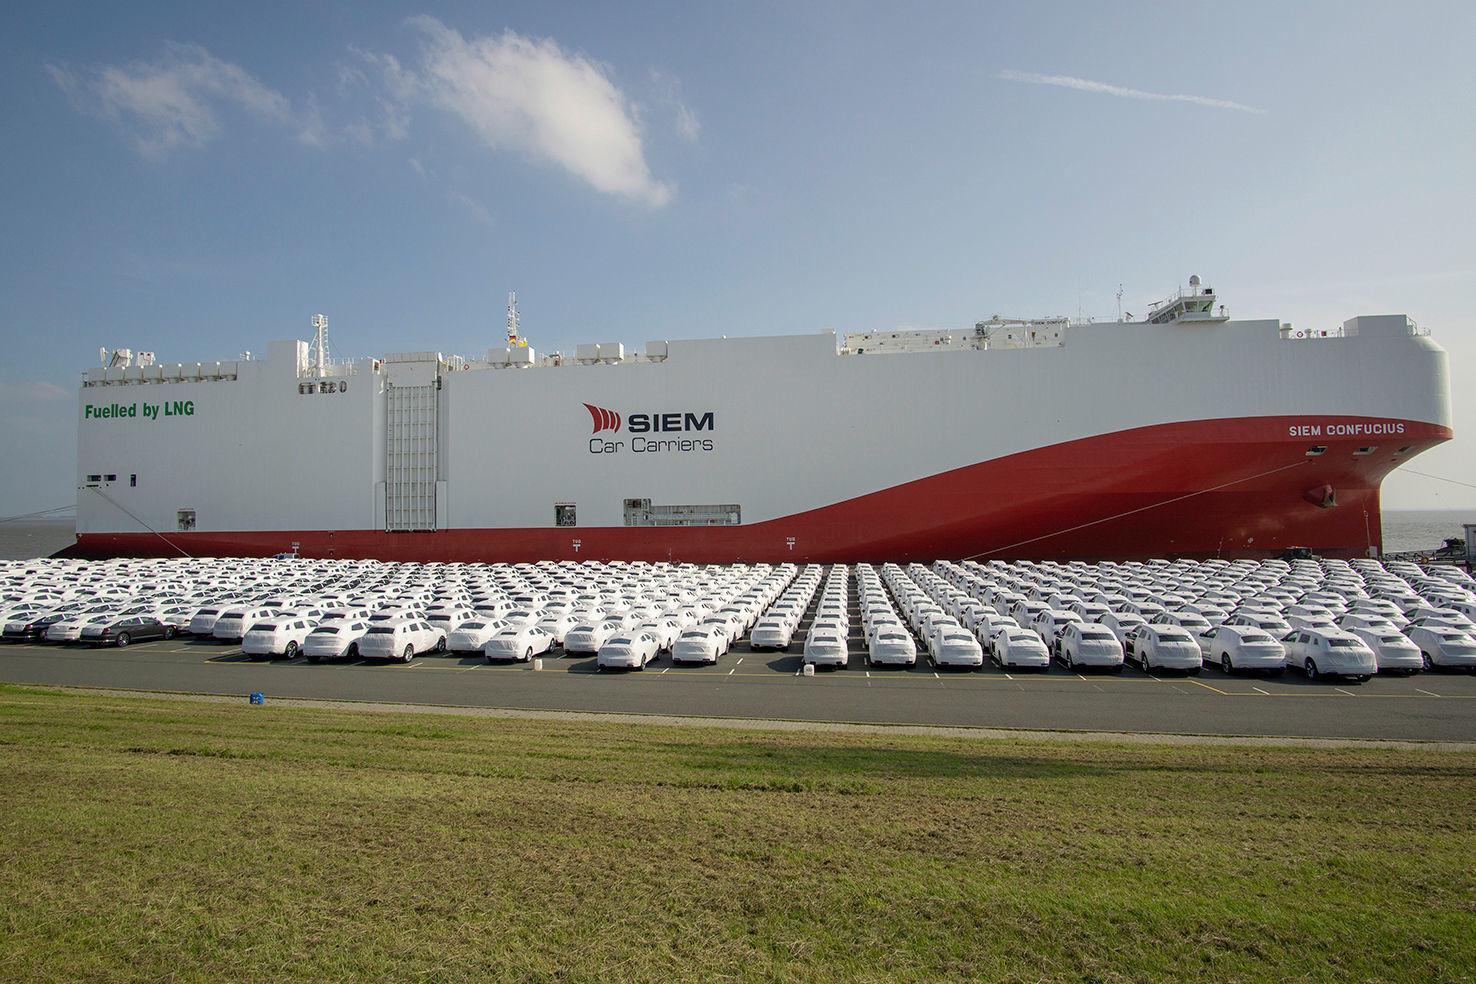 Volkswagen LNG car carrier